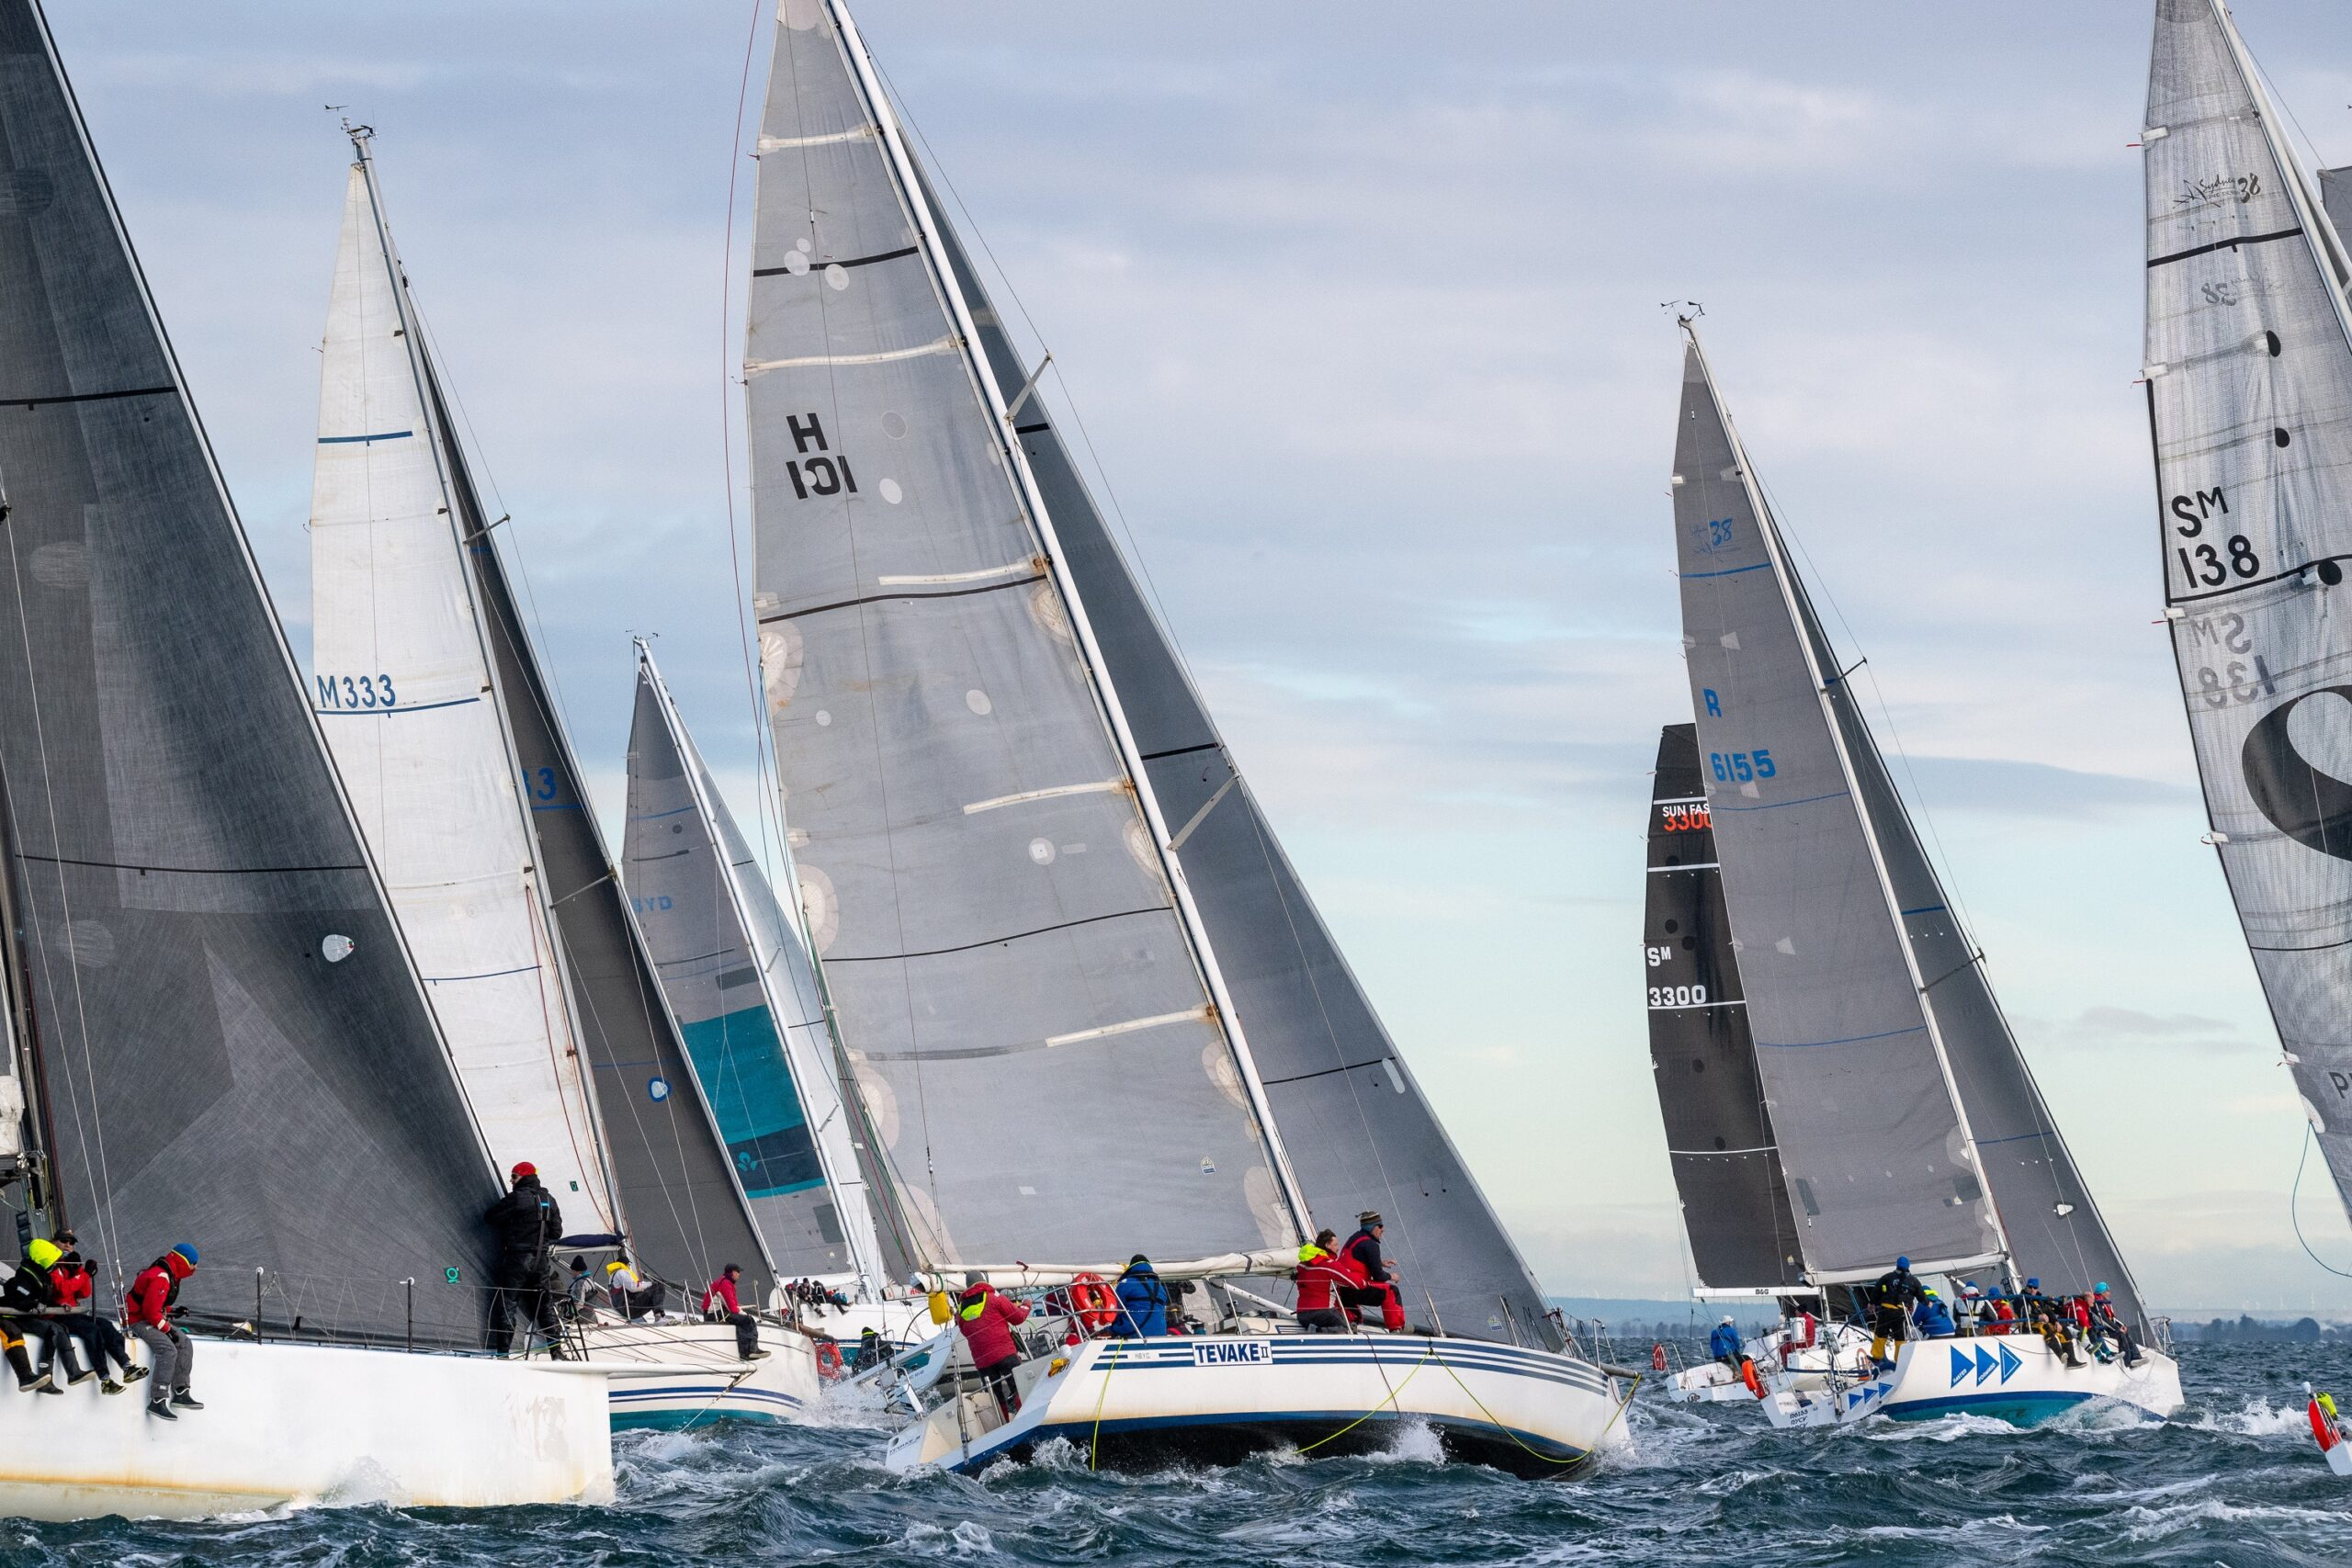 Yacht feet sailing upwind.